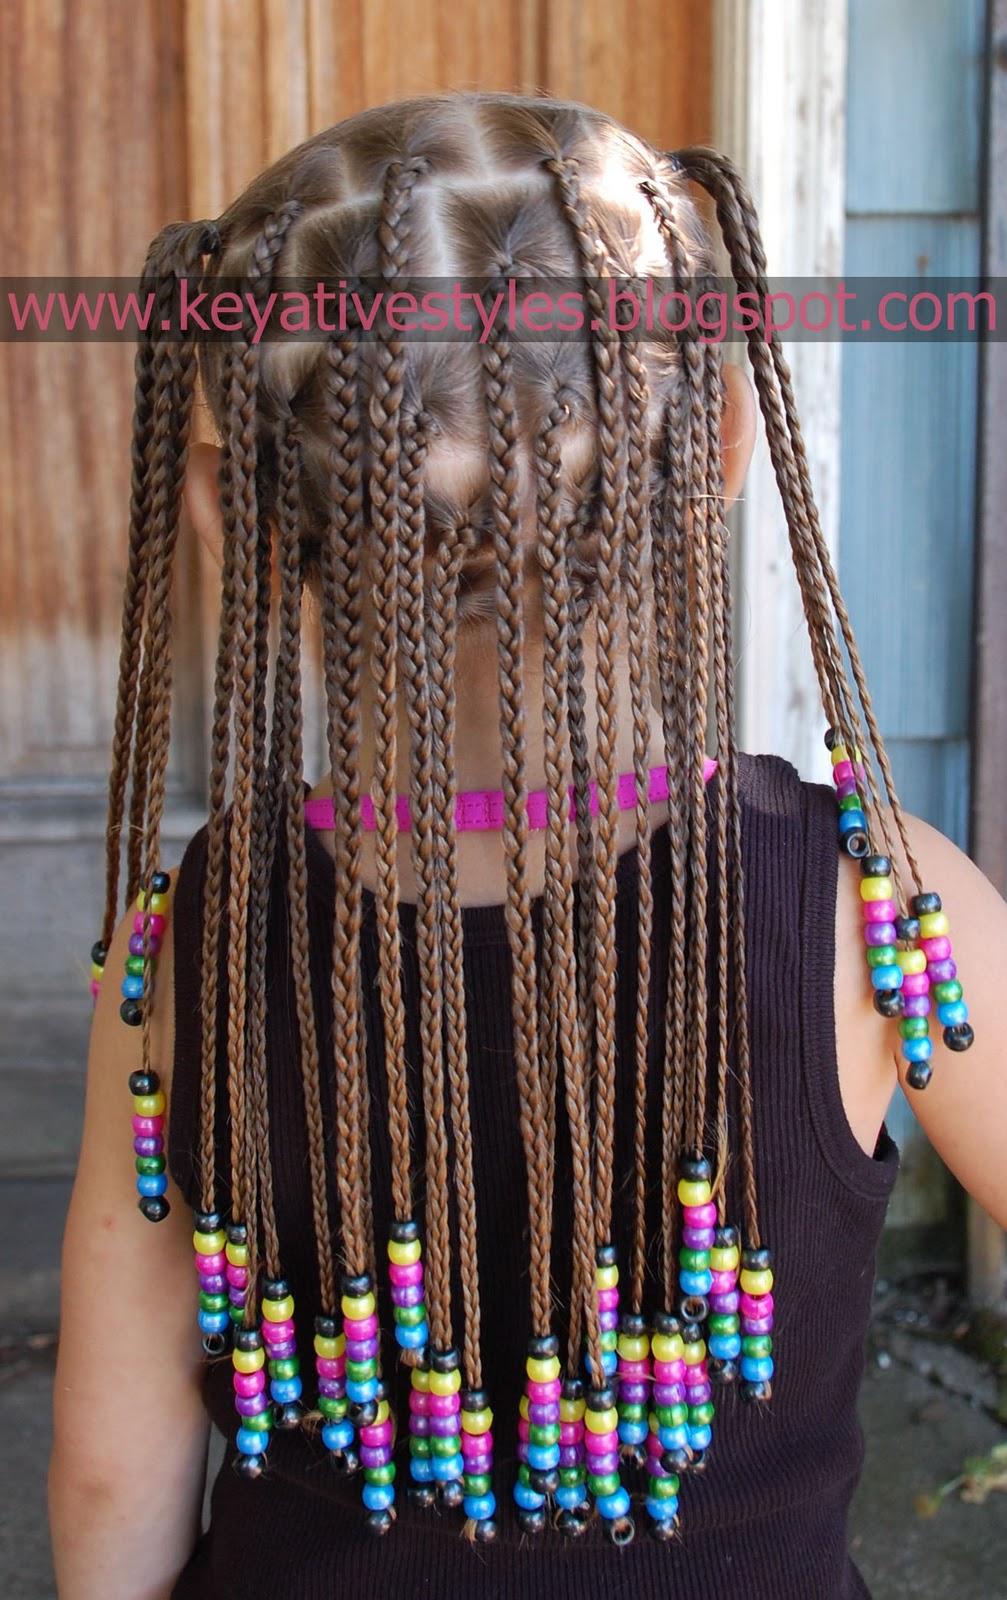 Keyative Styles: Box Braids With Floating Beads